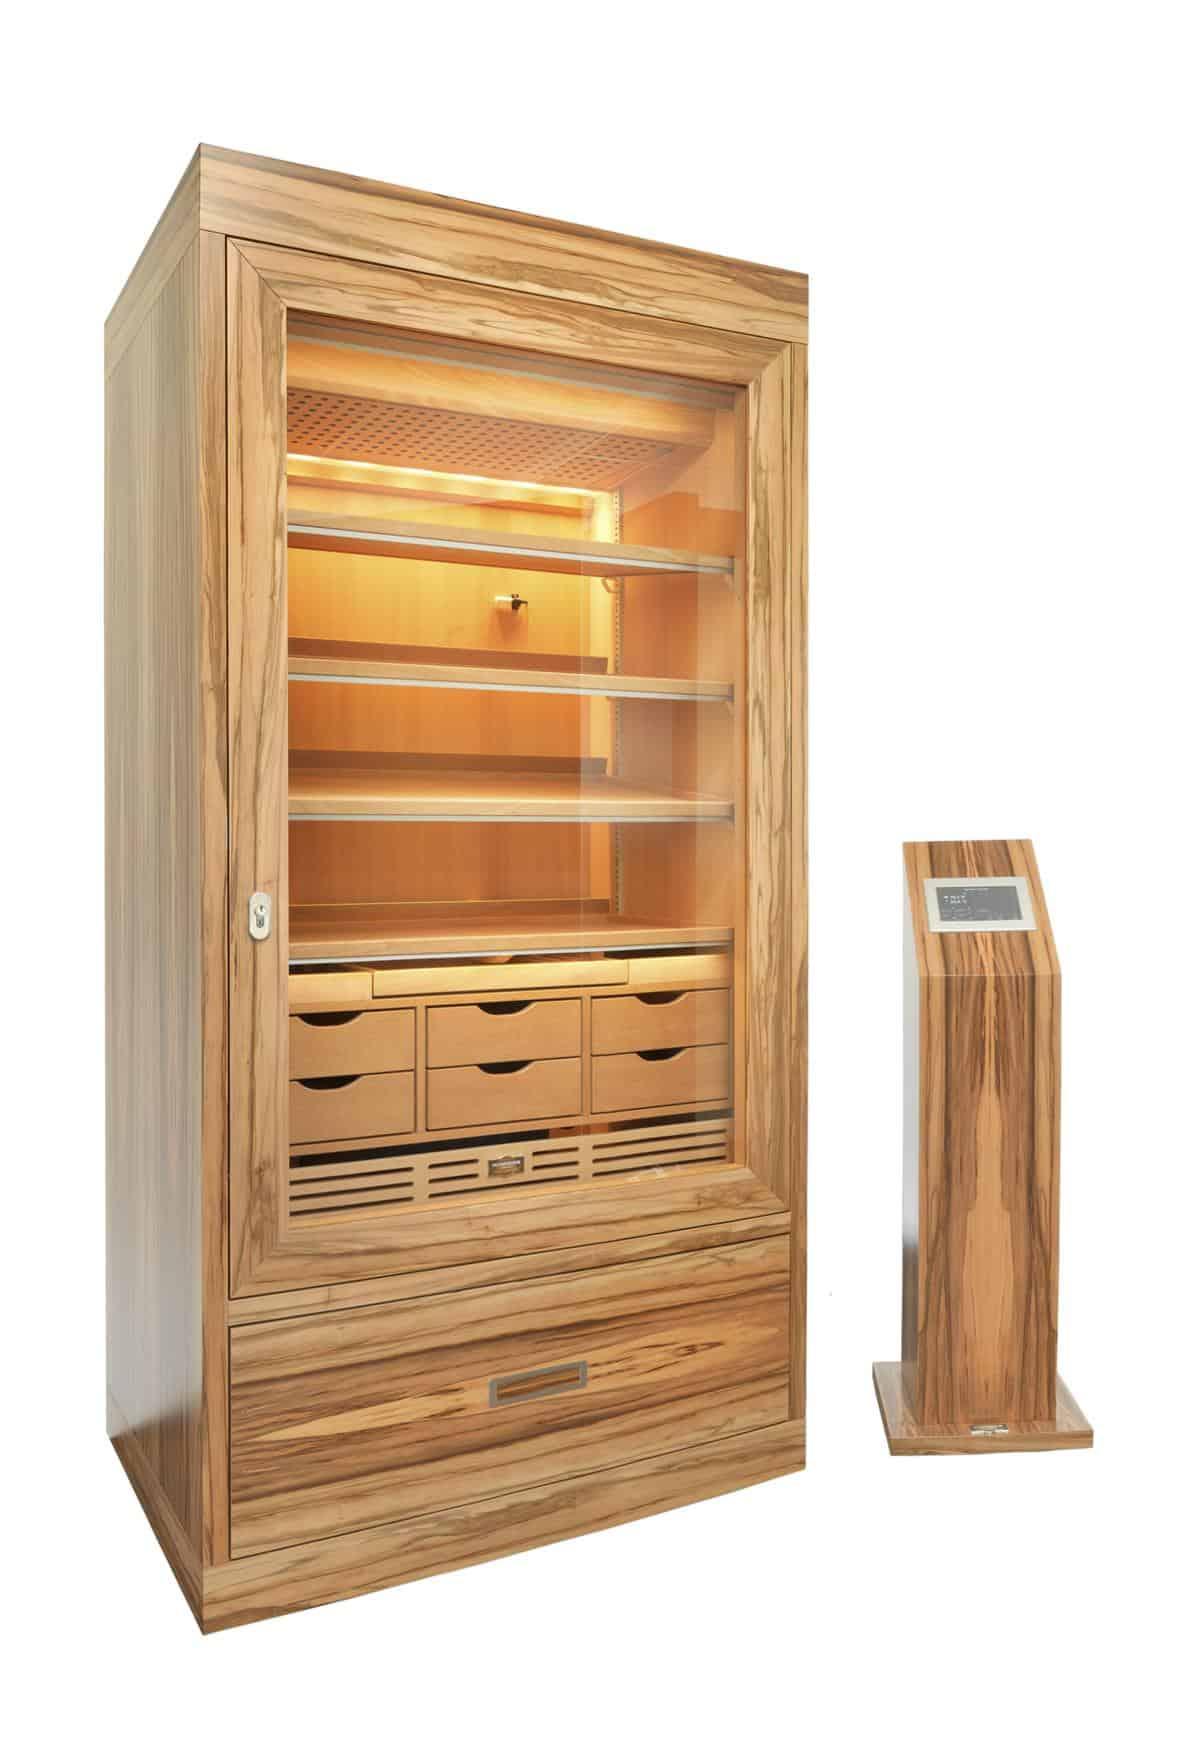 Cabinet Humidor Number One Satin Walnut » GERBER Humidors